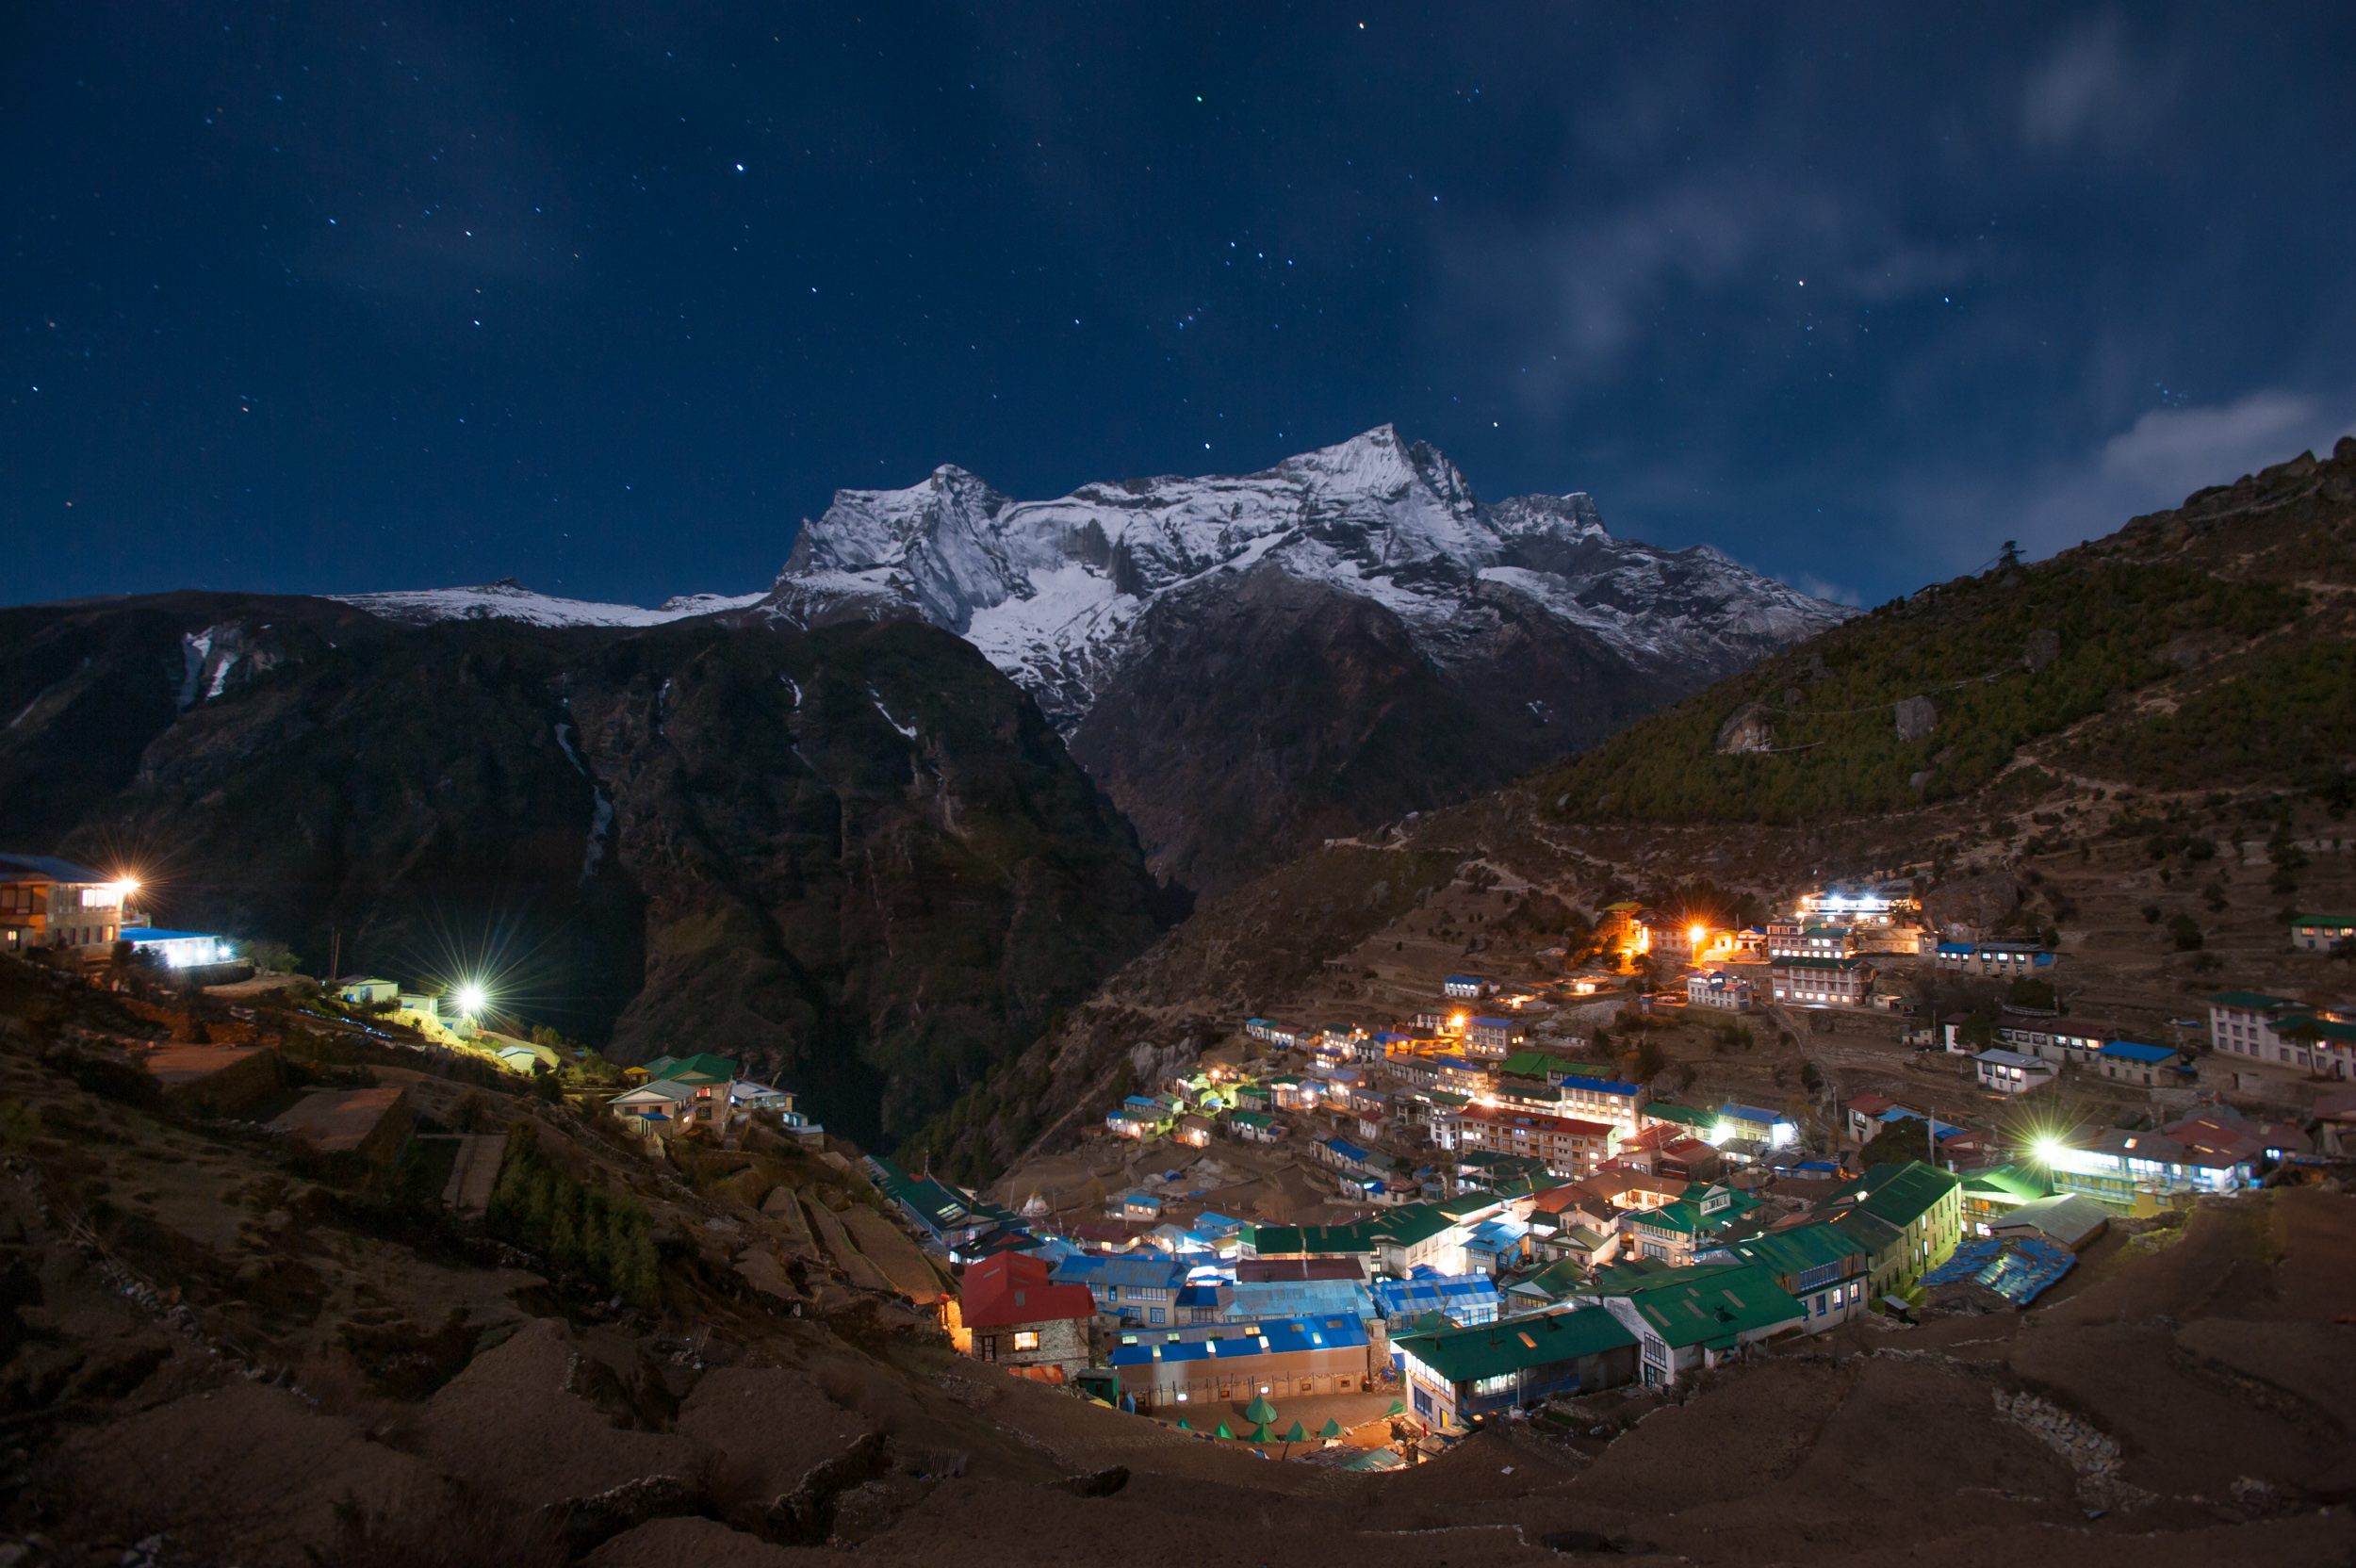 Namche Bazaar in the Everest region of Nepal